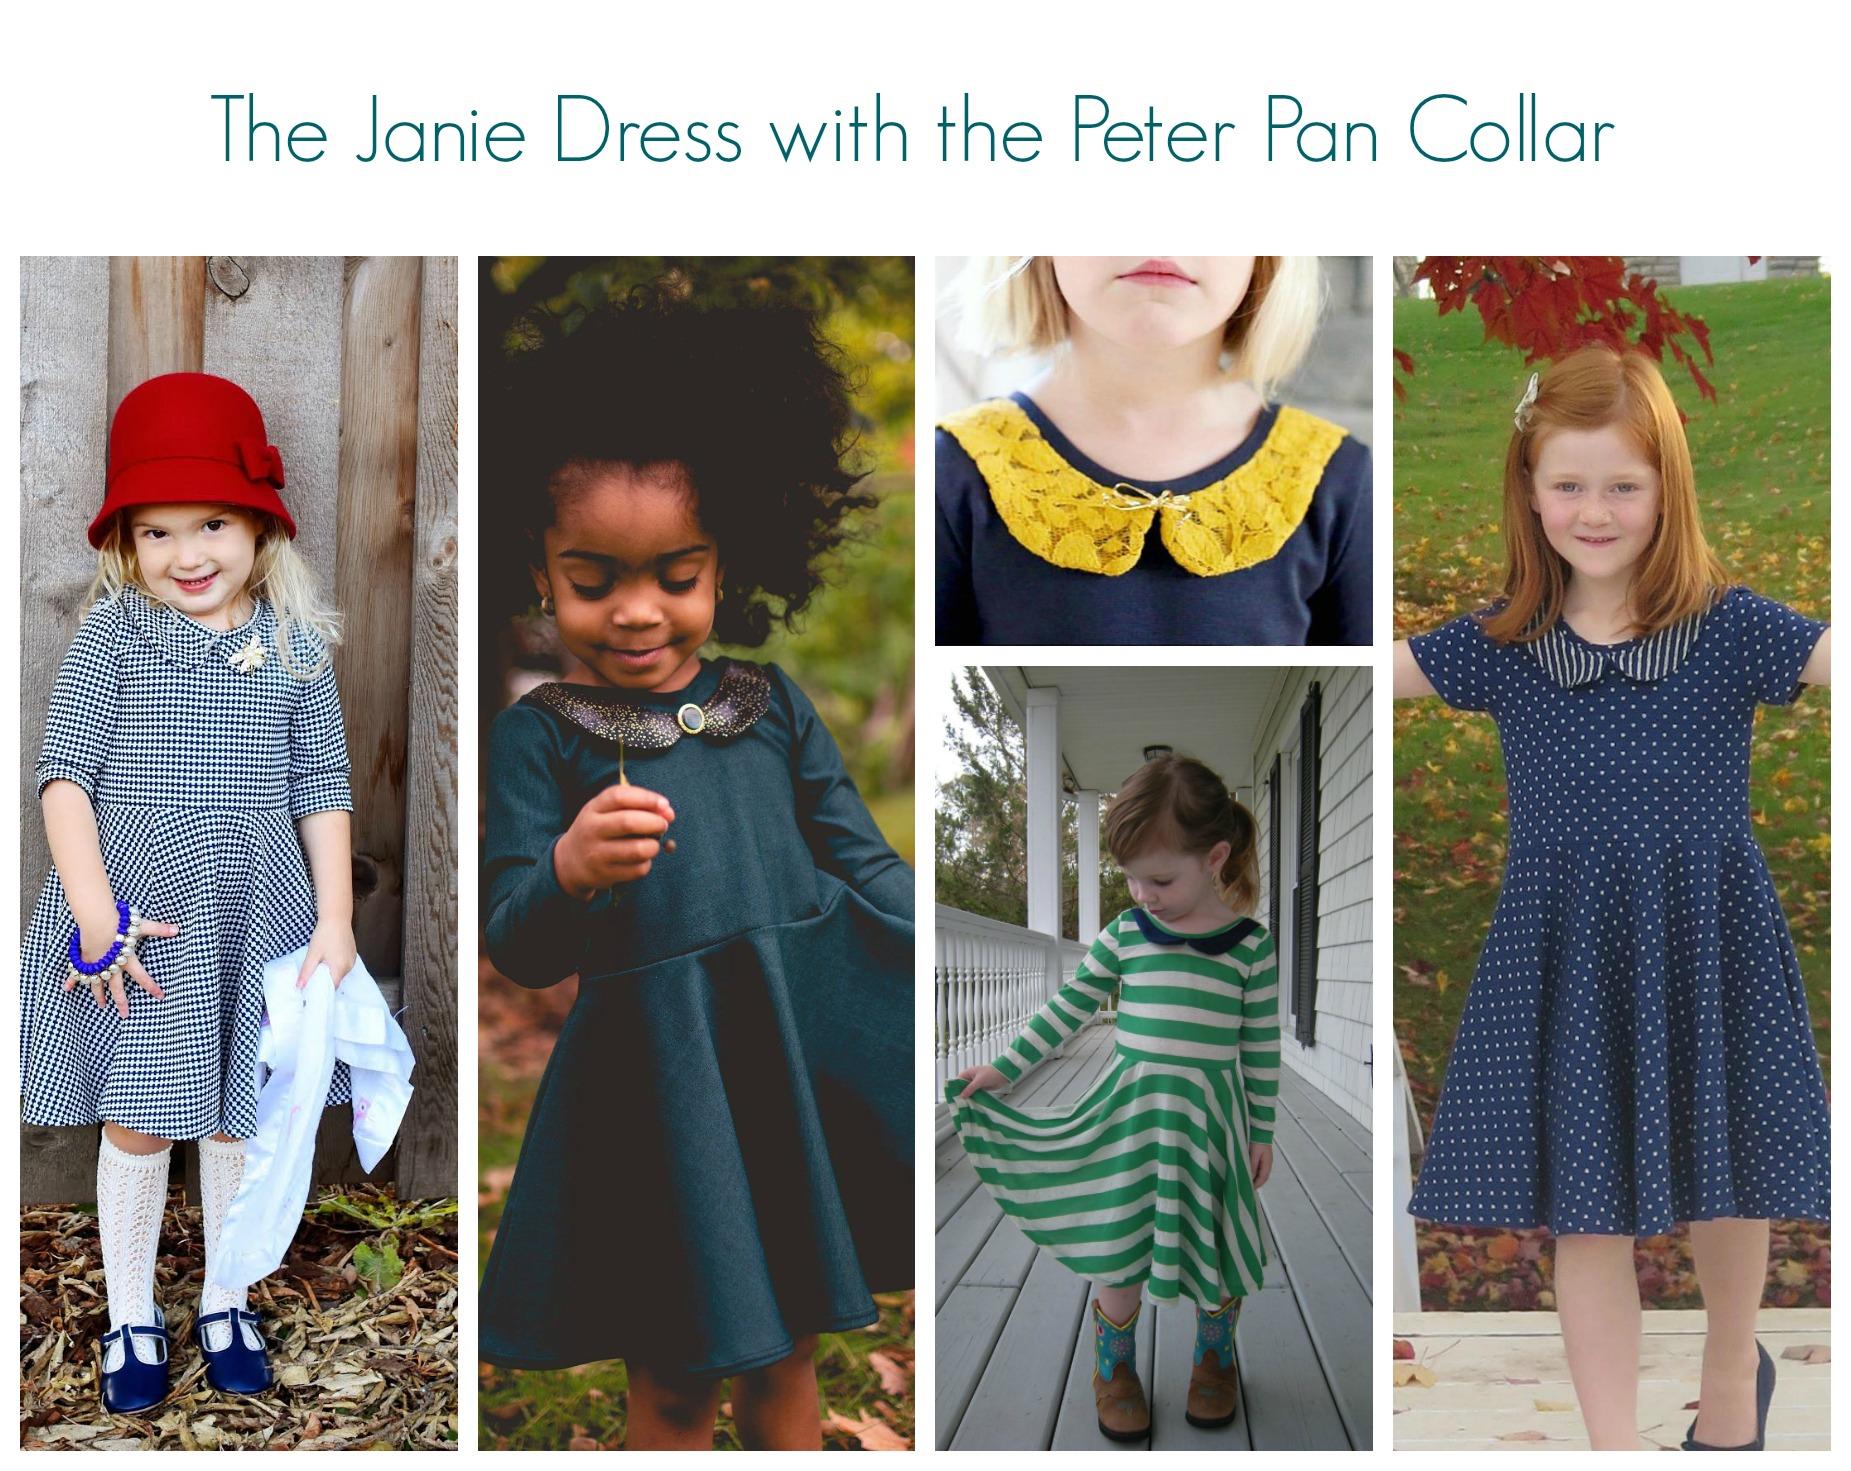 janie-peter-pan-collar-collage